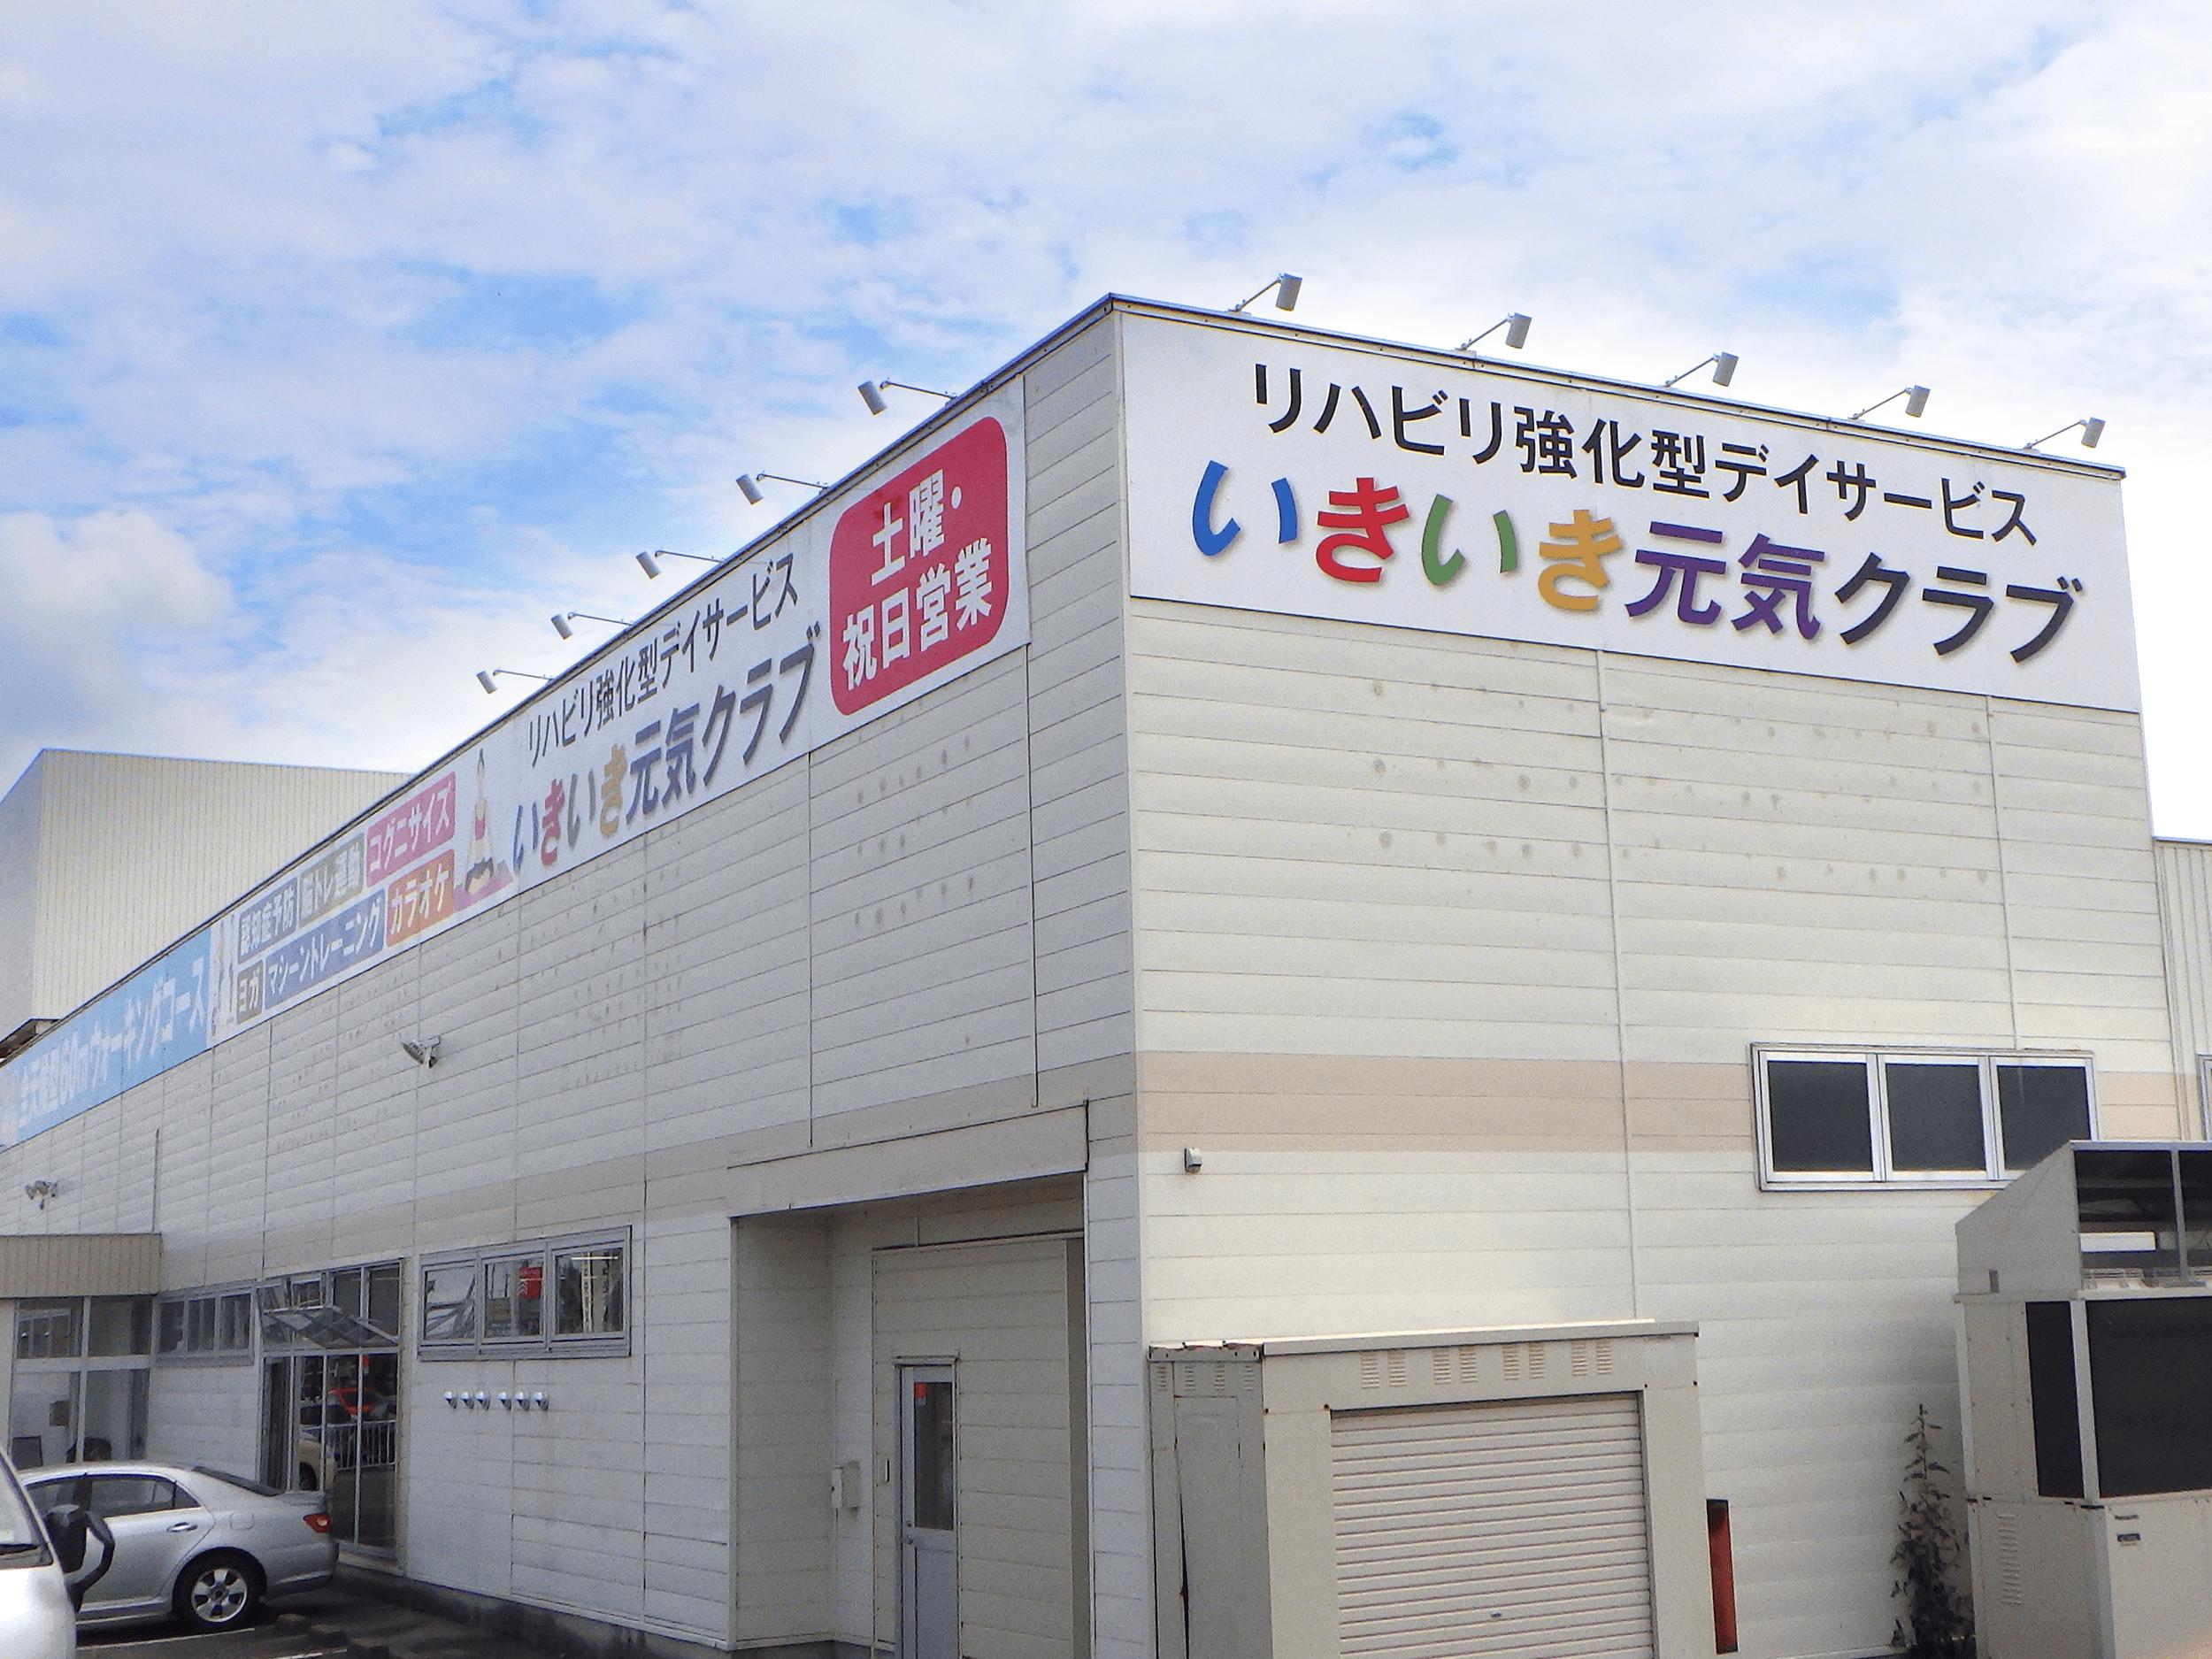 LEDアームライト看板 施工事例写真 富山県 現状の看板用照明が暗いため、夜間看板が目立つように照明器具を交換したい